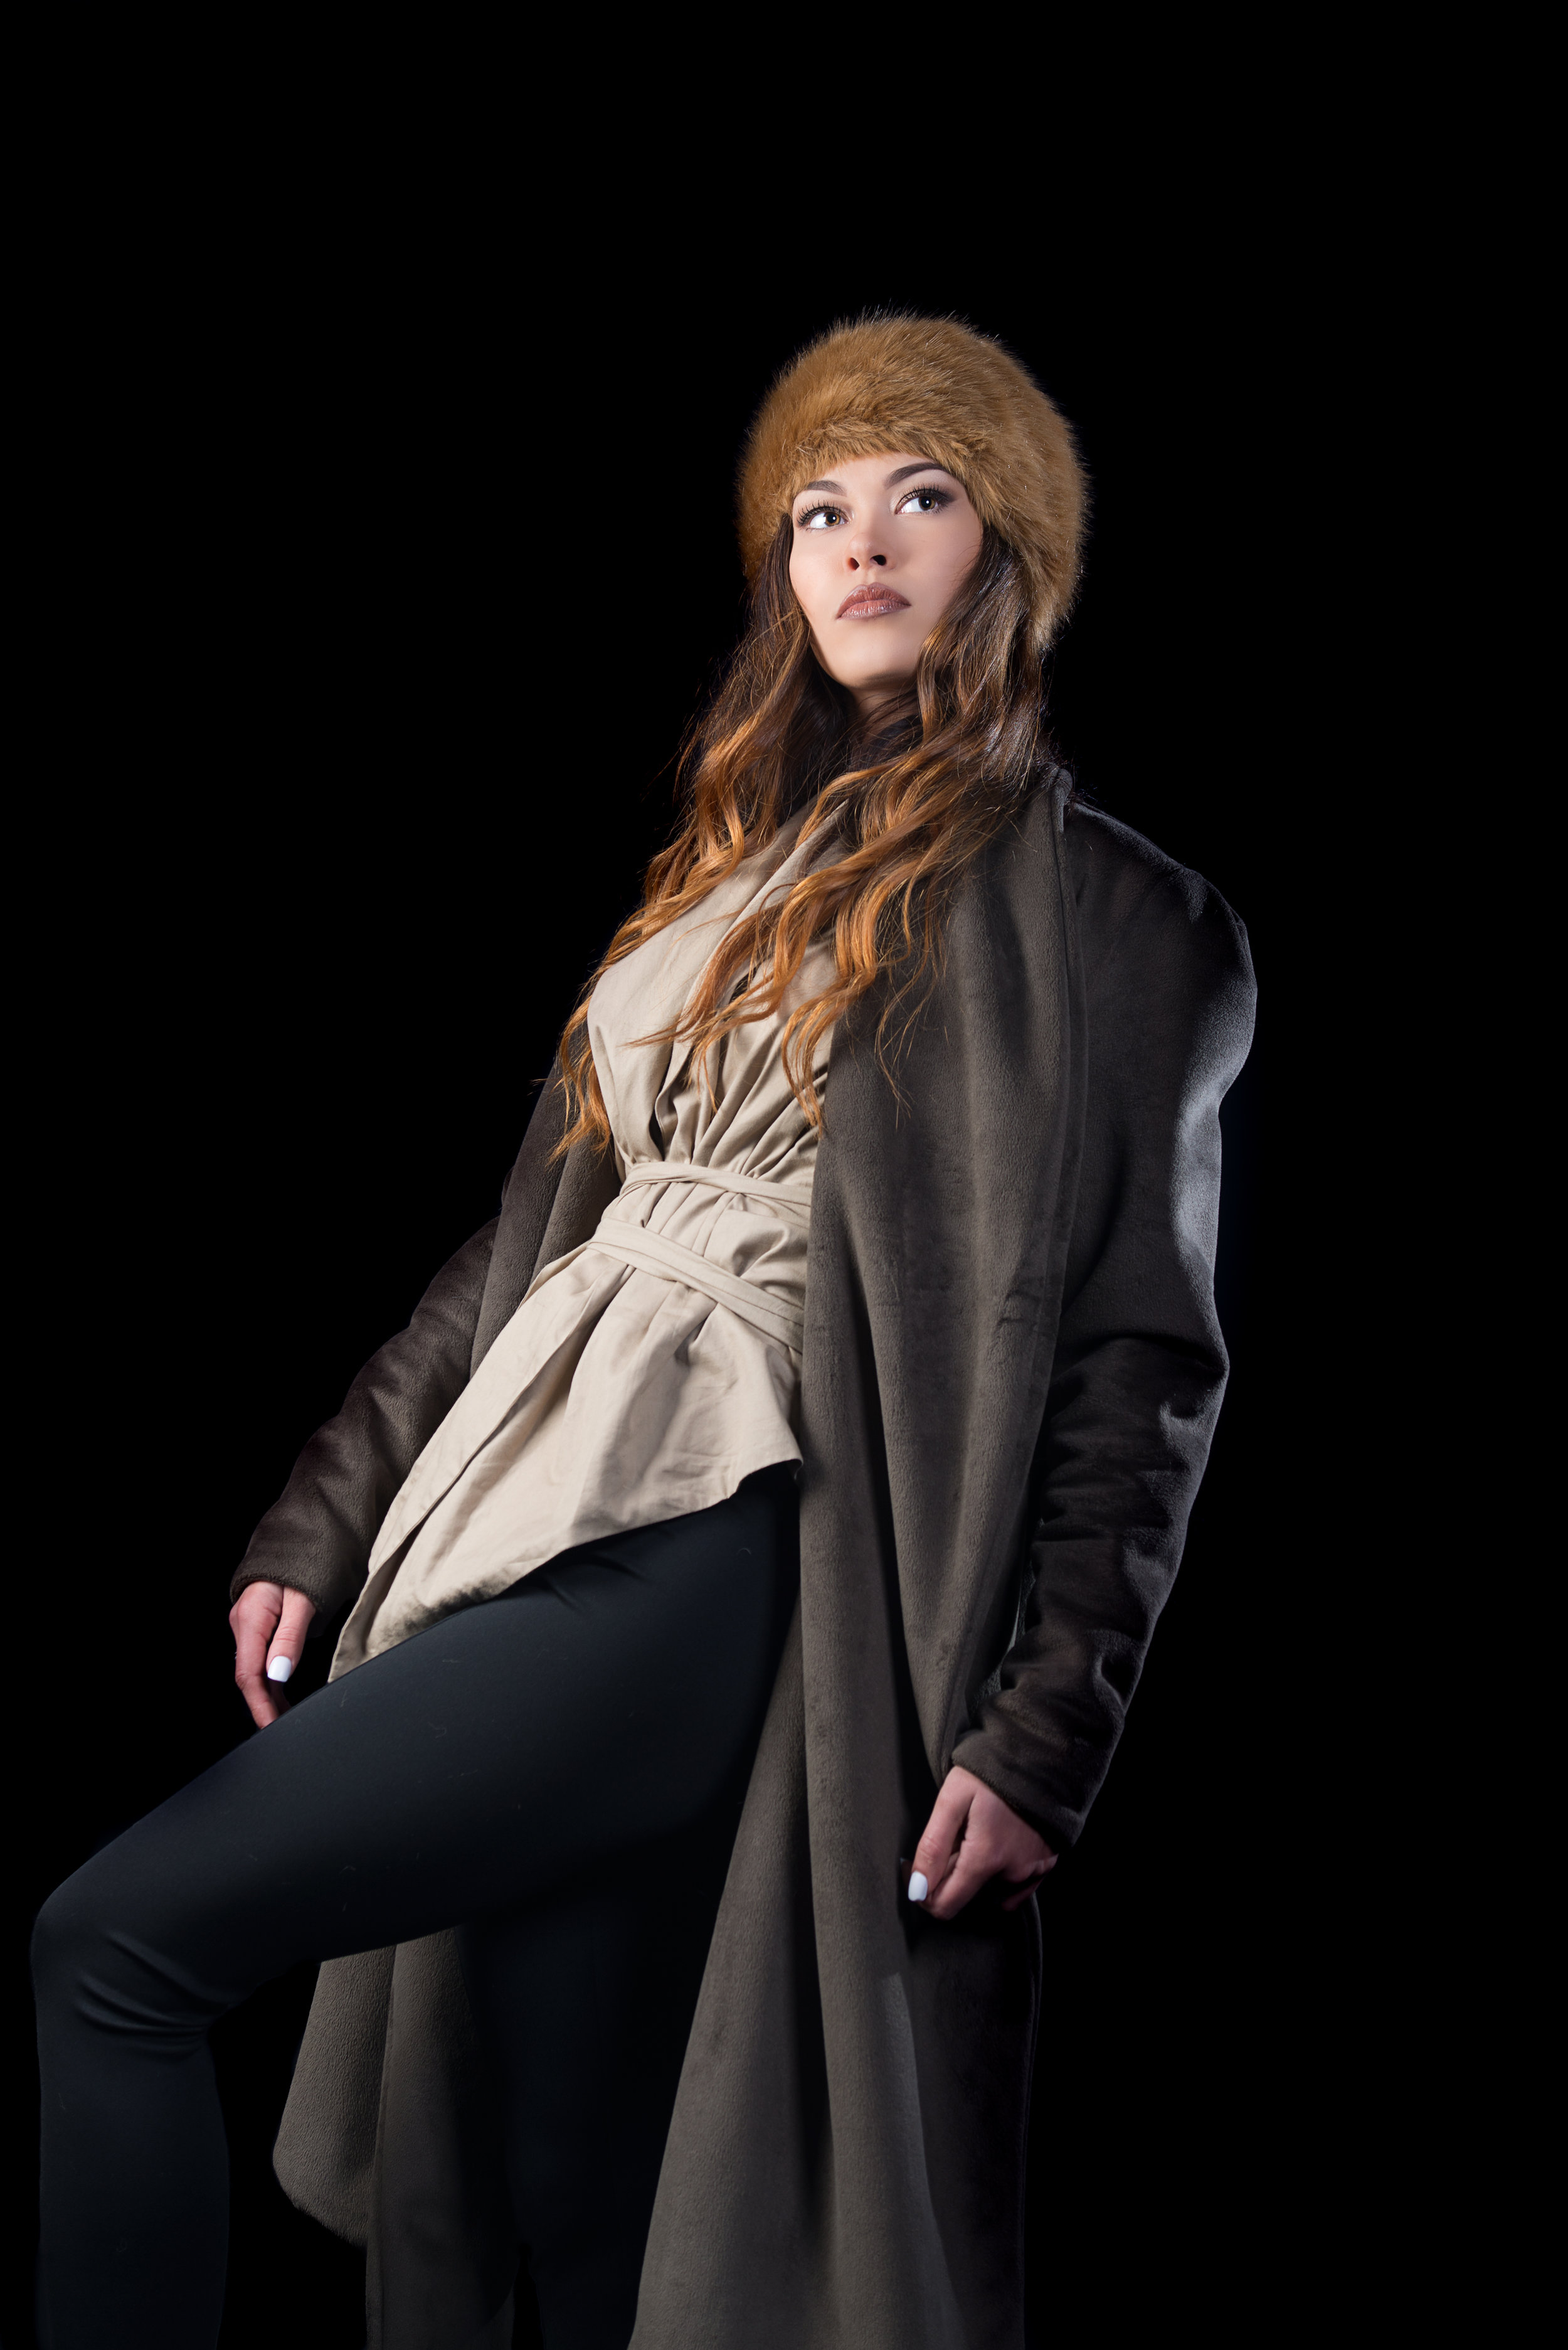 zaramia-ava-zaramiaava-leeds-fashion-designer-ethical-sustainable-tailored-minimalist-jacket-mai-coat-jacket-black-mioka-obi-belt-top-versatile-drape-cowl-styling-studio-womenswear-models-photoshoot-4